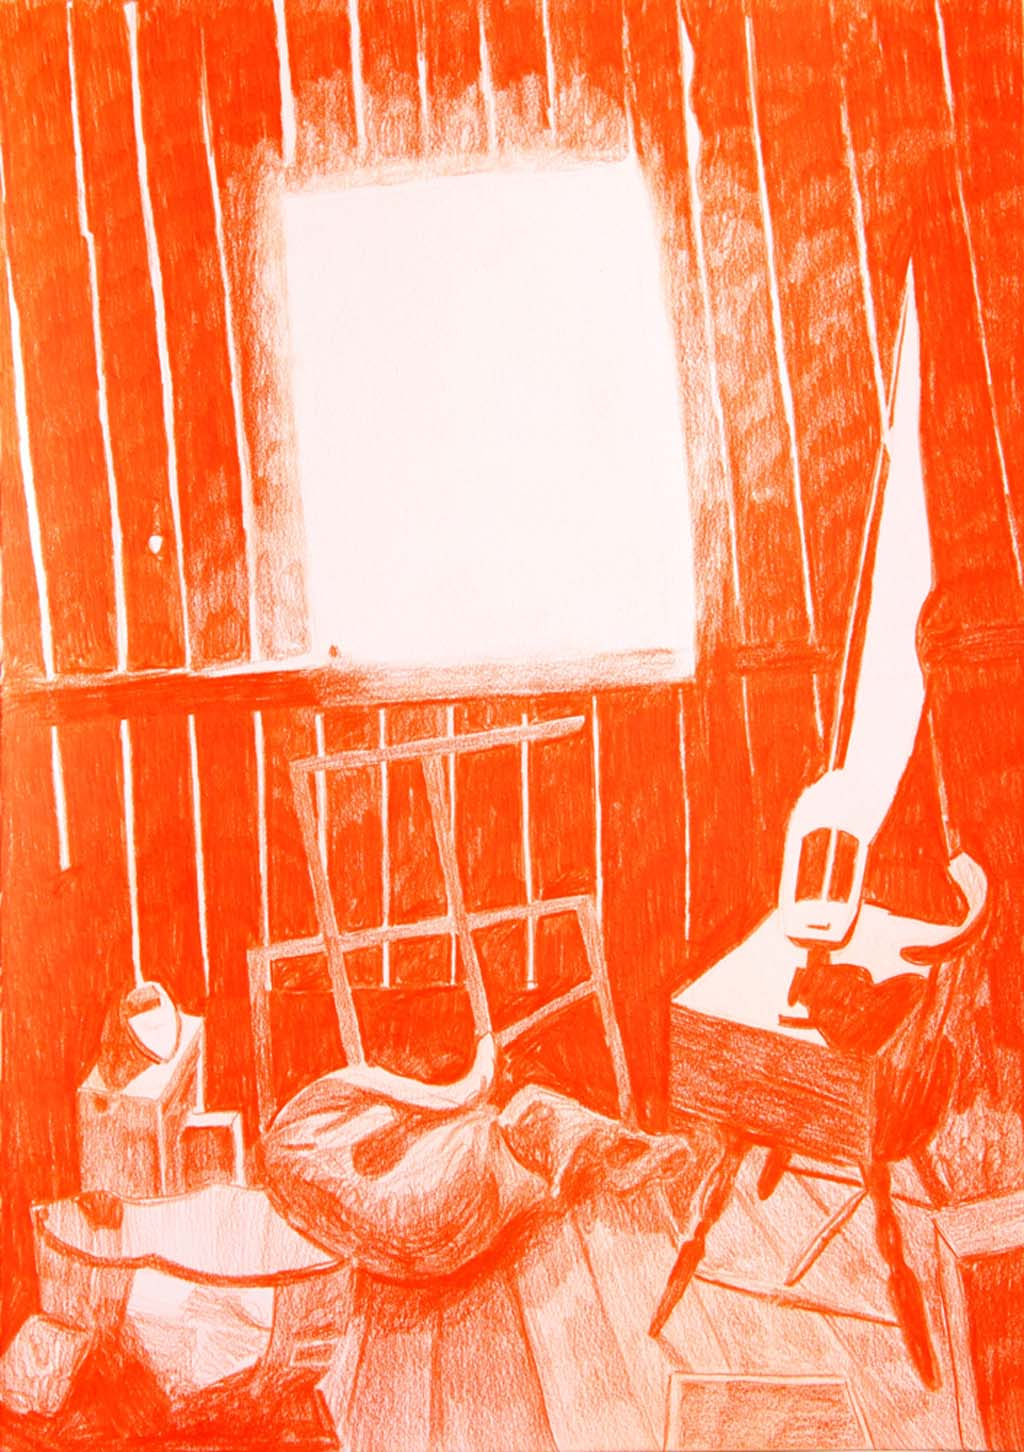 Morten Schelde, Tannåker, 2015, colourpencil on paper, 42 X 29 cm, framed